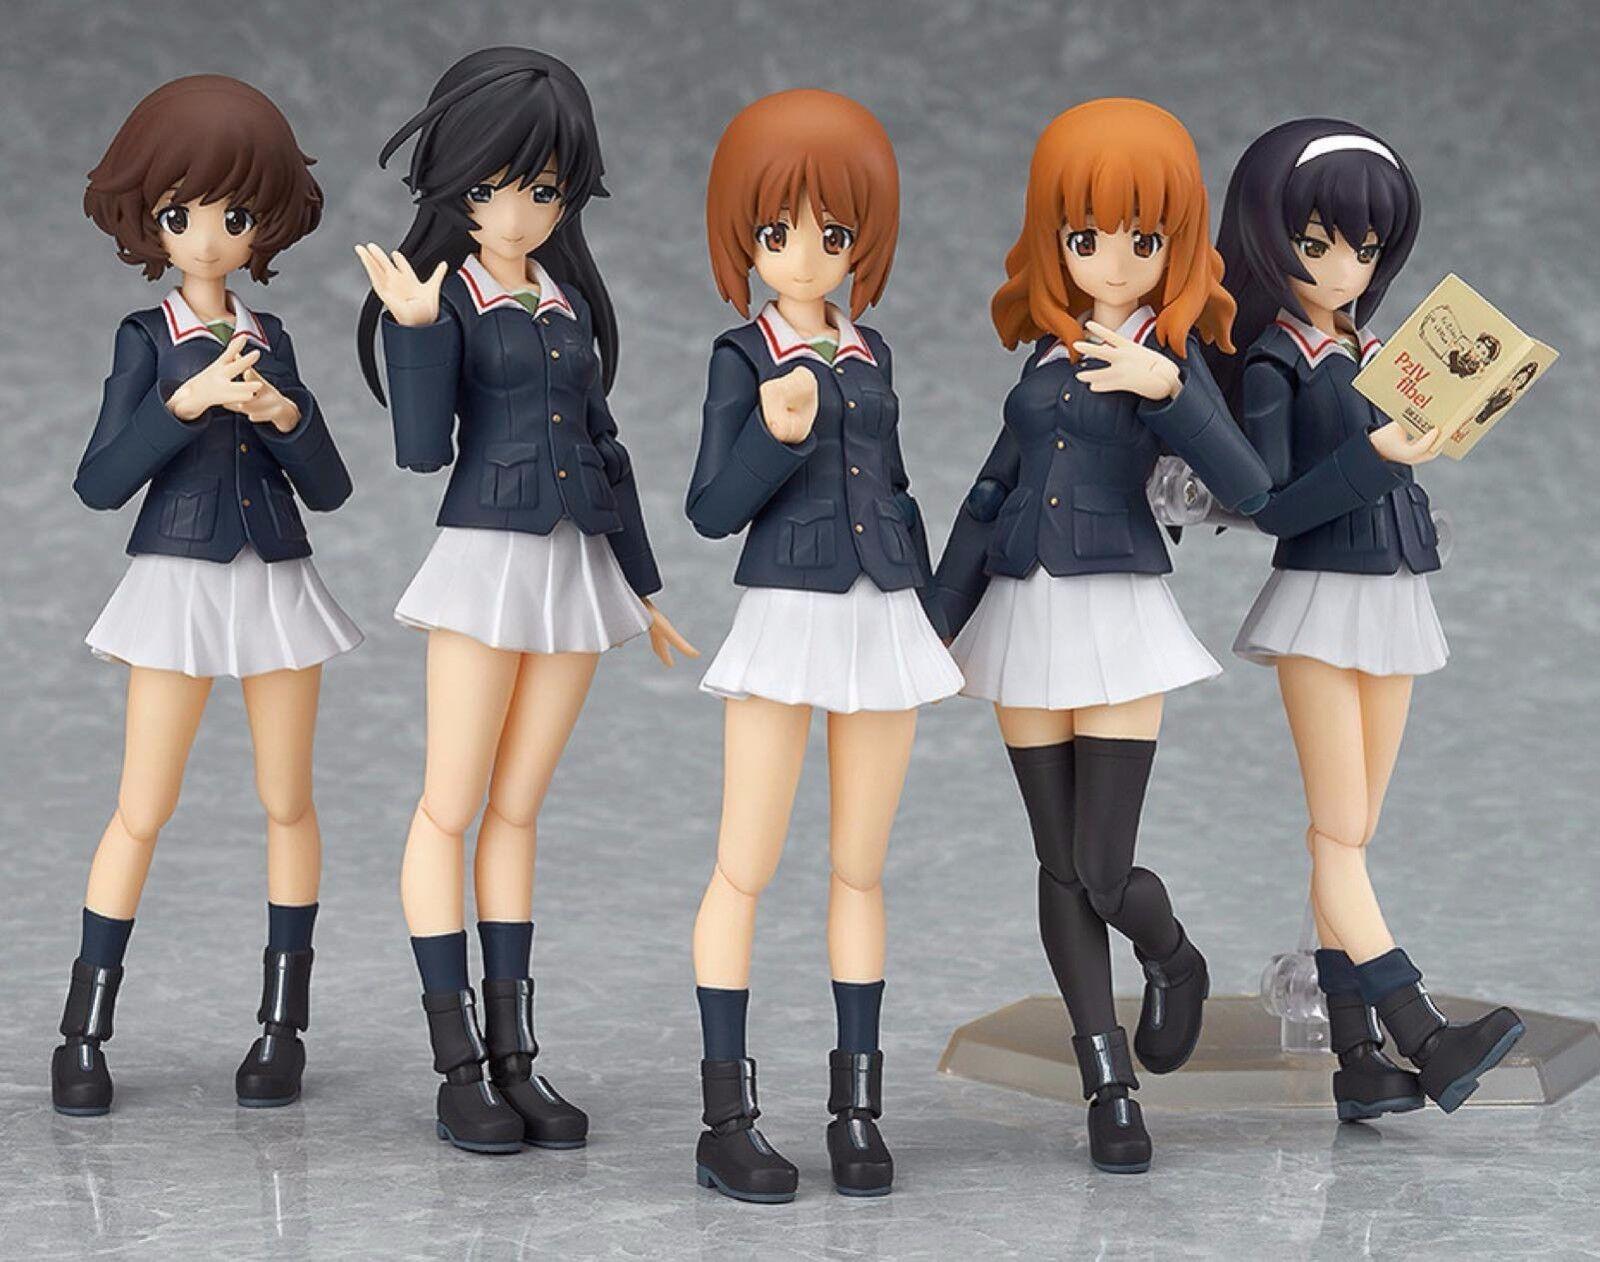 Figma EX-031 Girls und Panzer Ankou Team Set Figure Max Factory From Japan F S